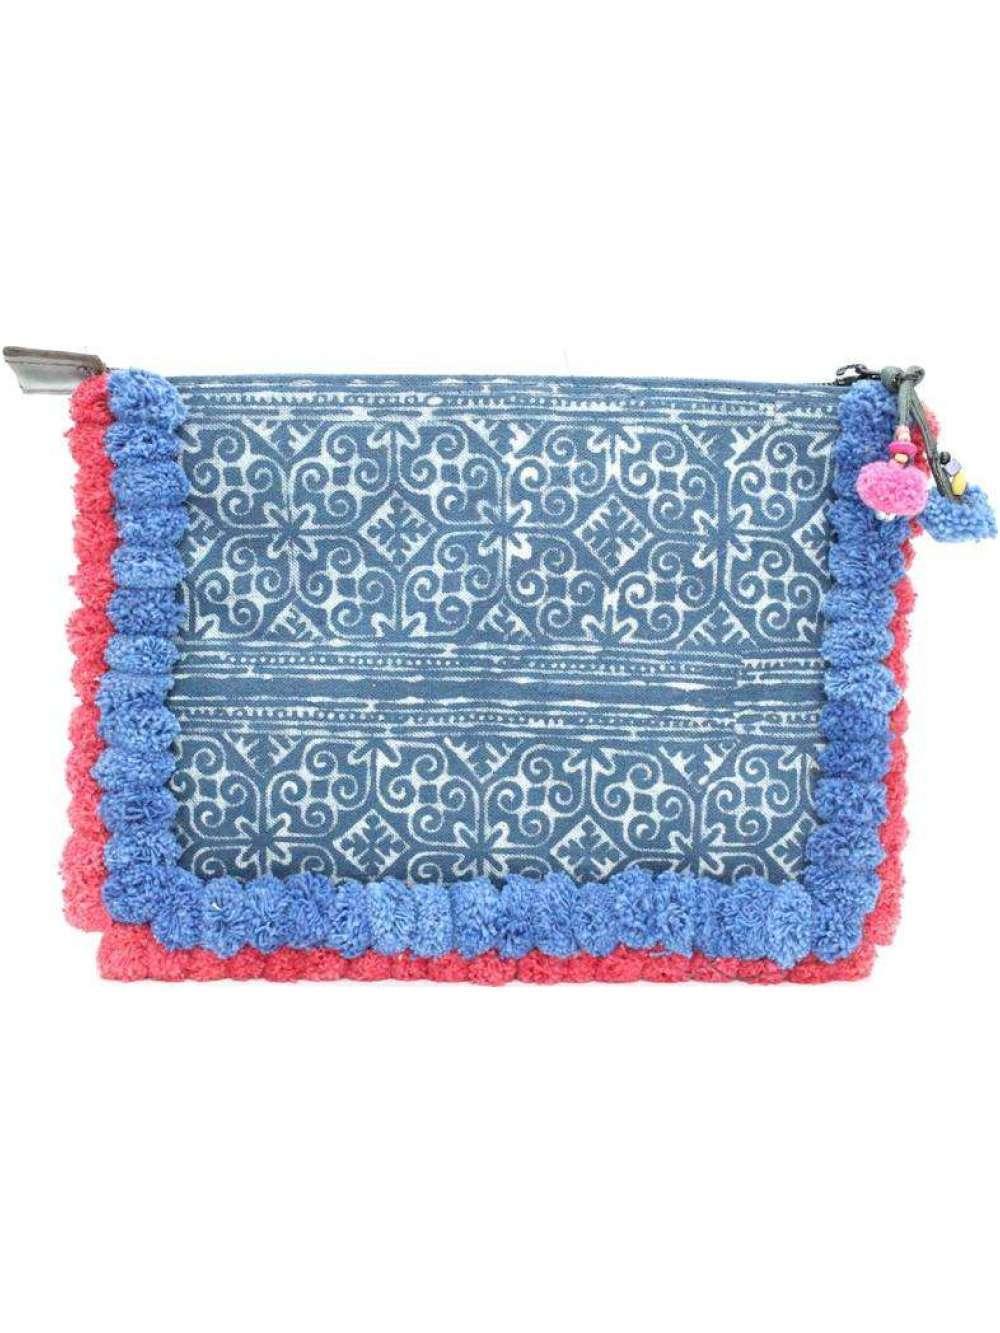 Batik Oversized Clutch with Blue Pom Poms